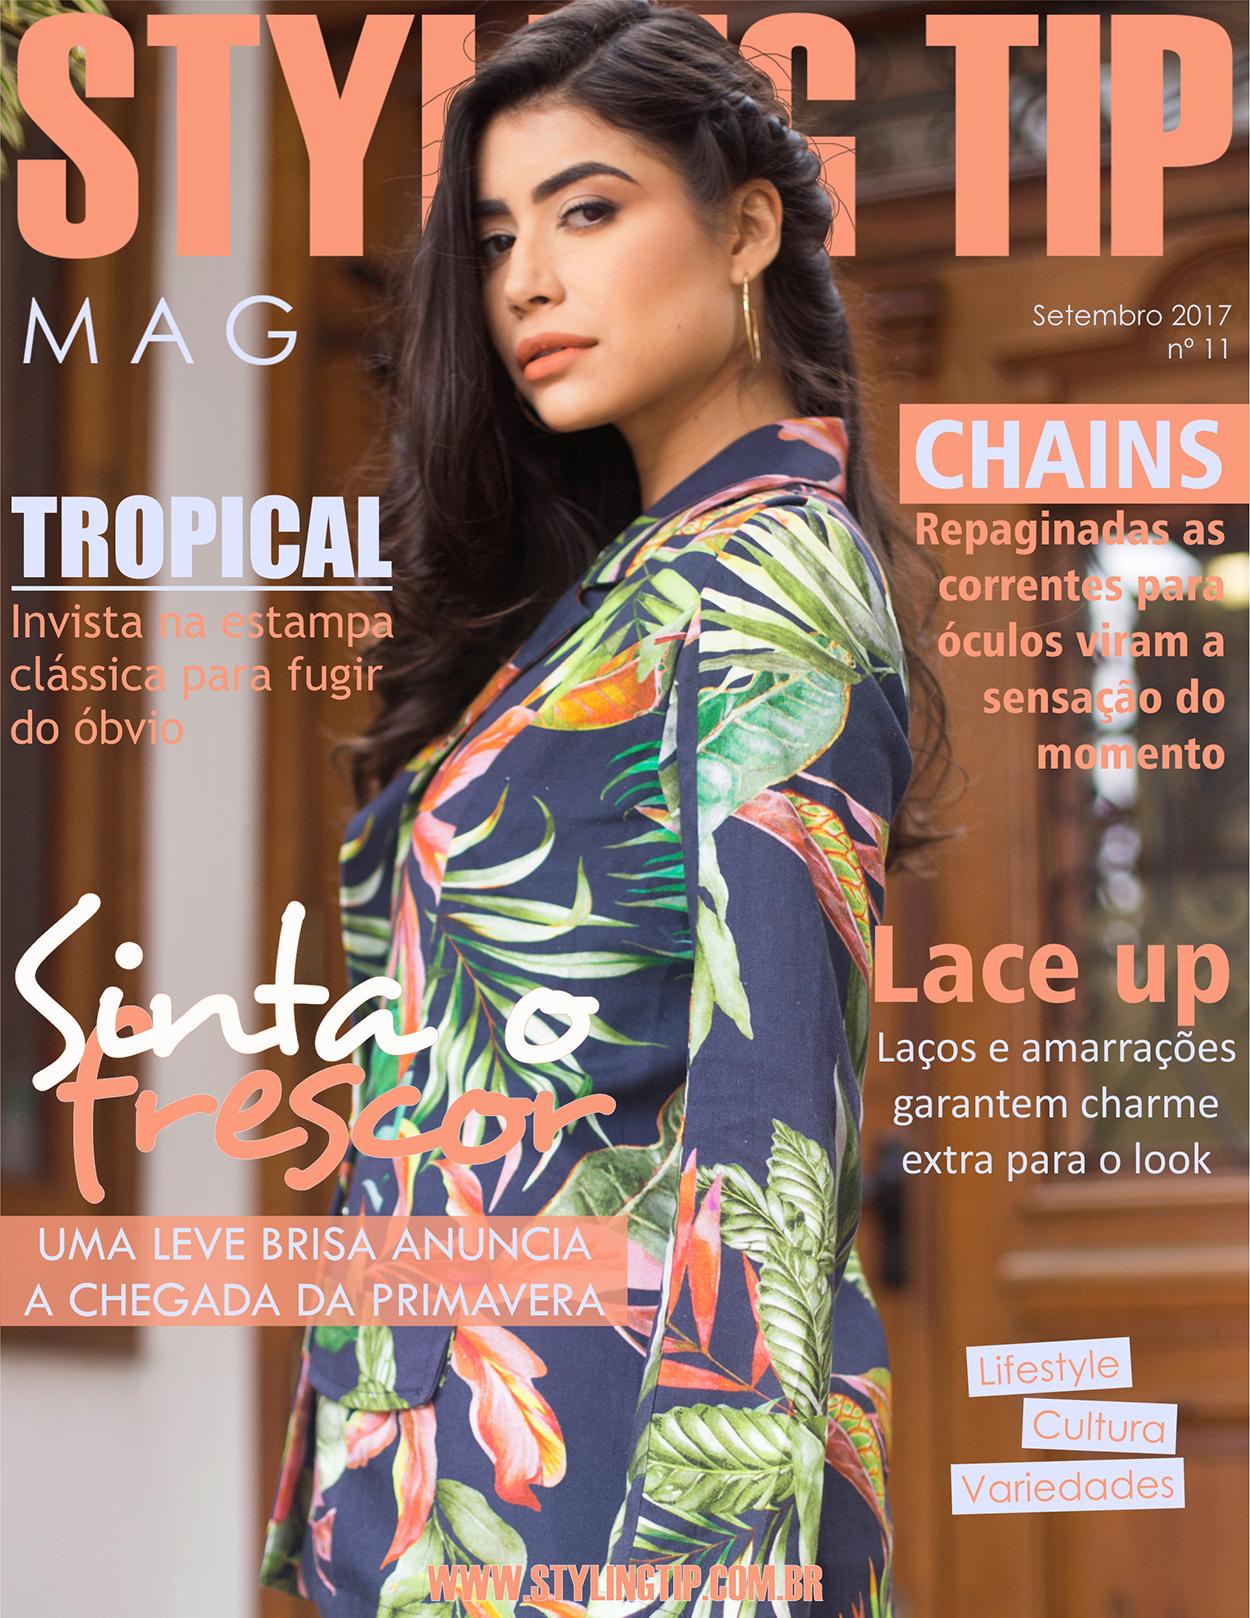 Capa STYLING TIP Mag Setembro 2017 - Especial Primavera